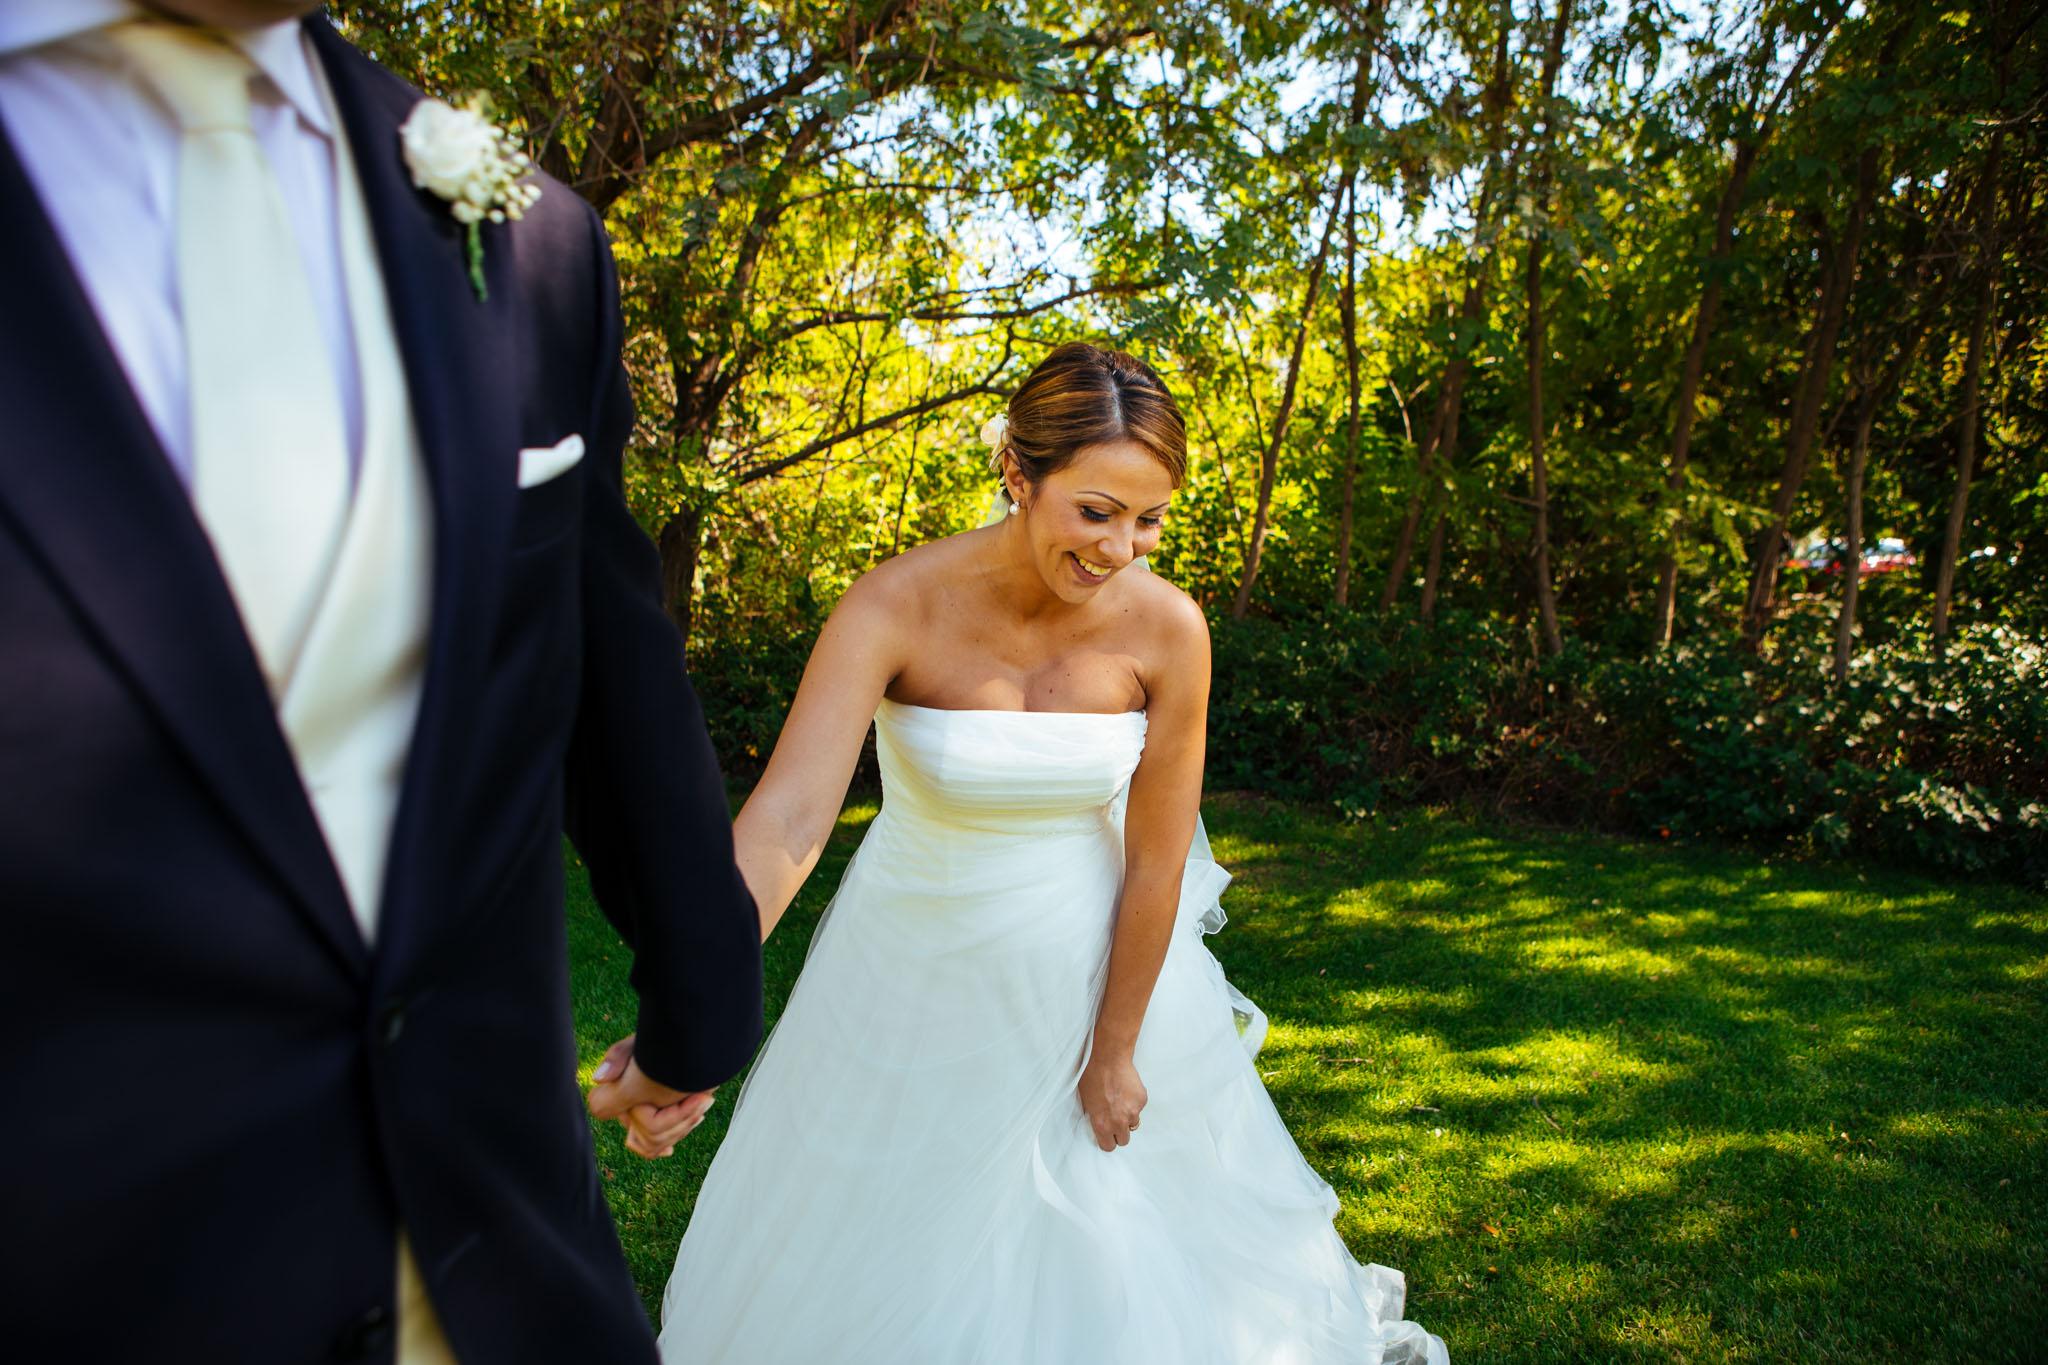 matrimonio-a-catania-49.jpg